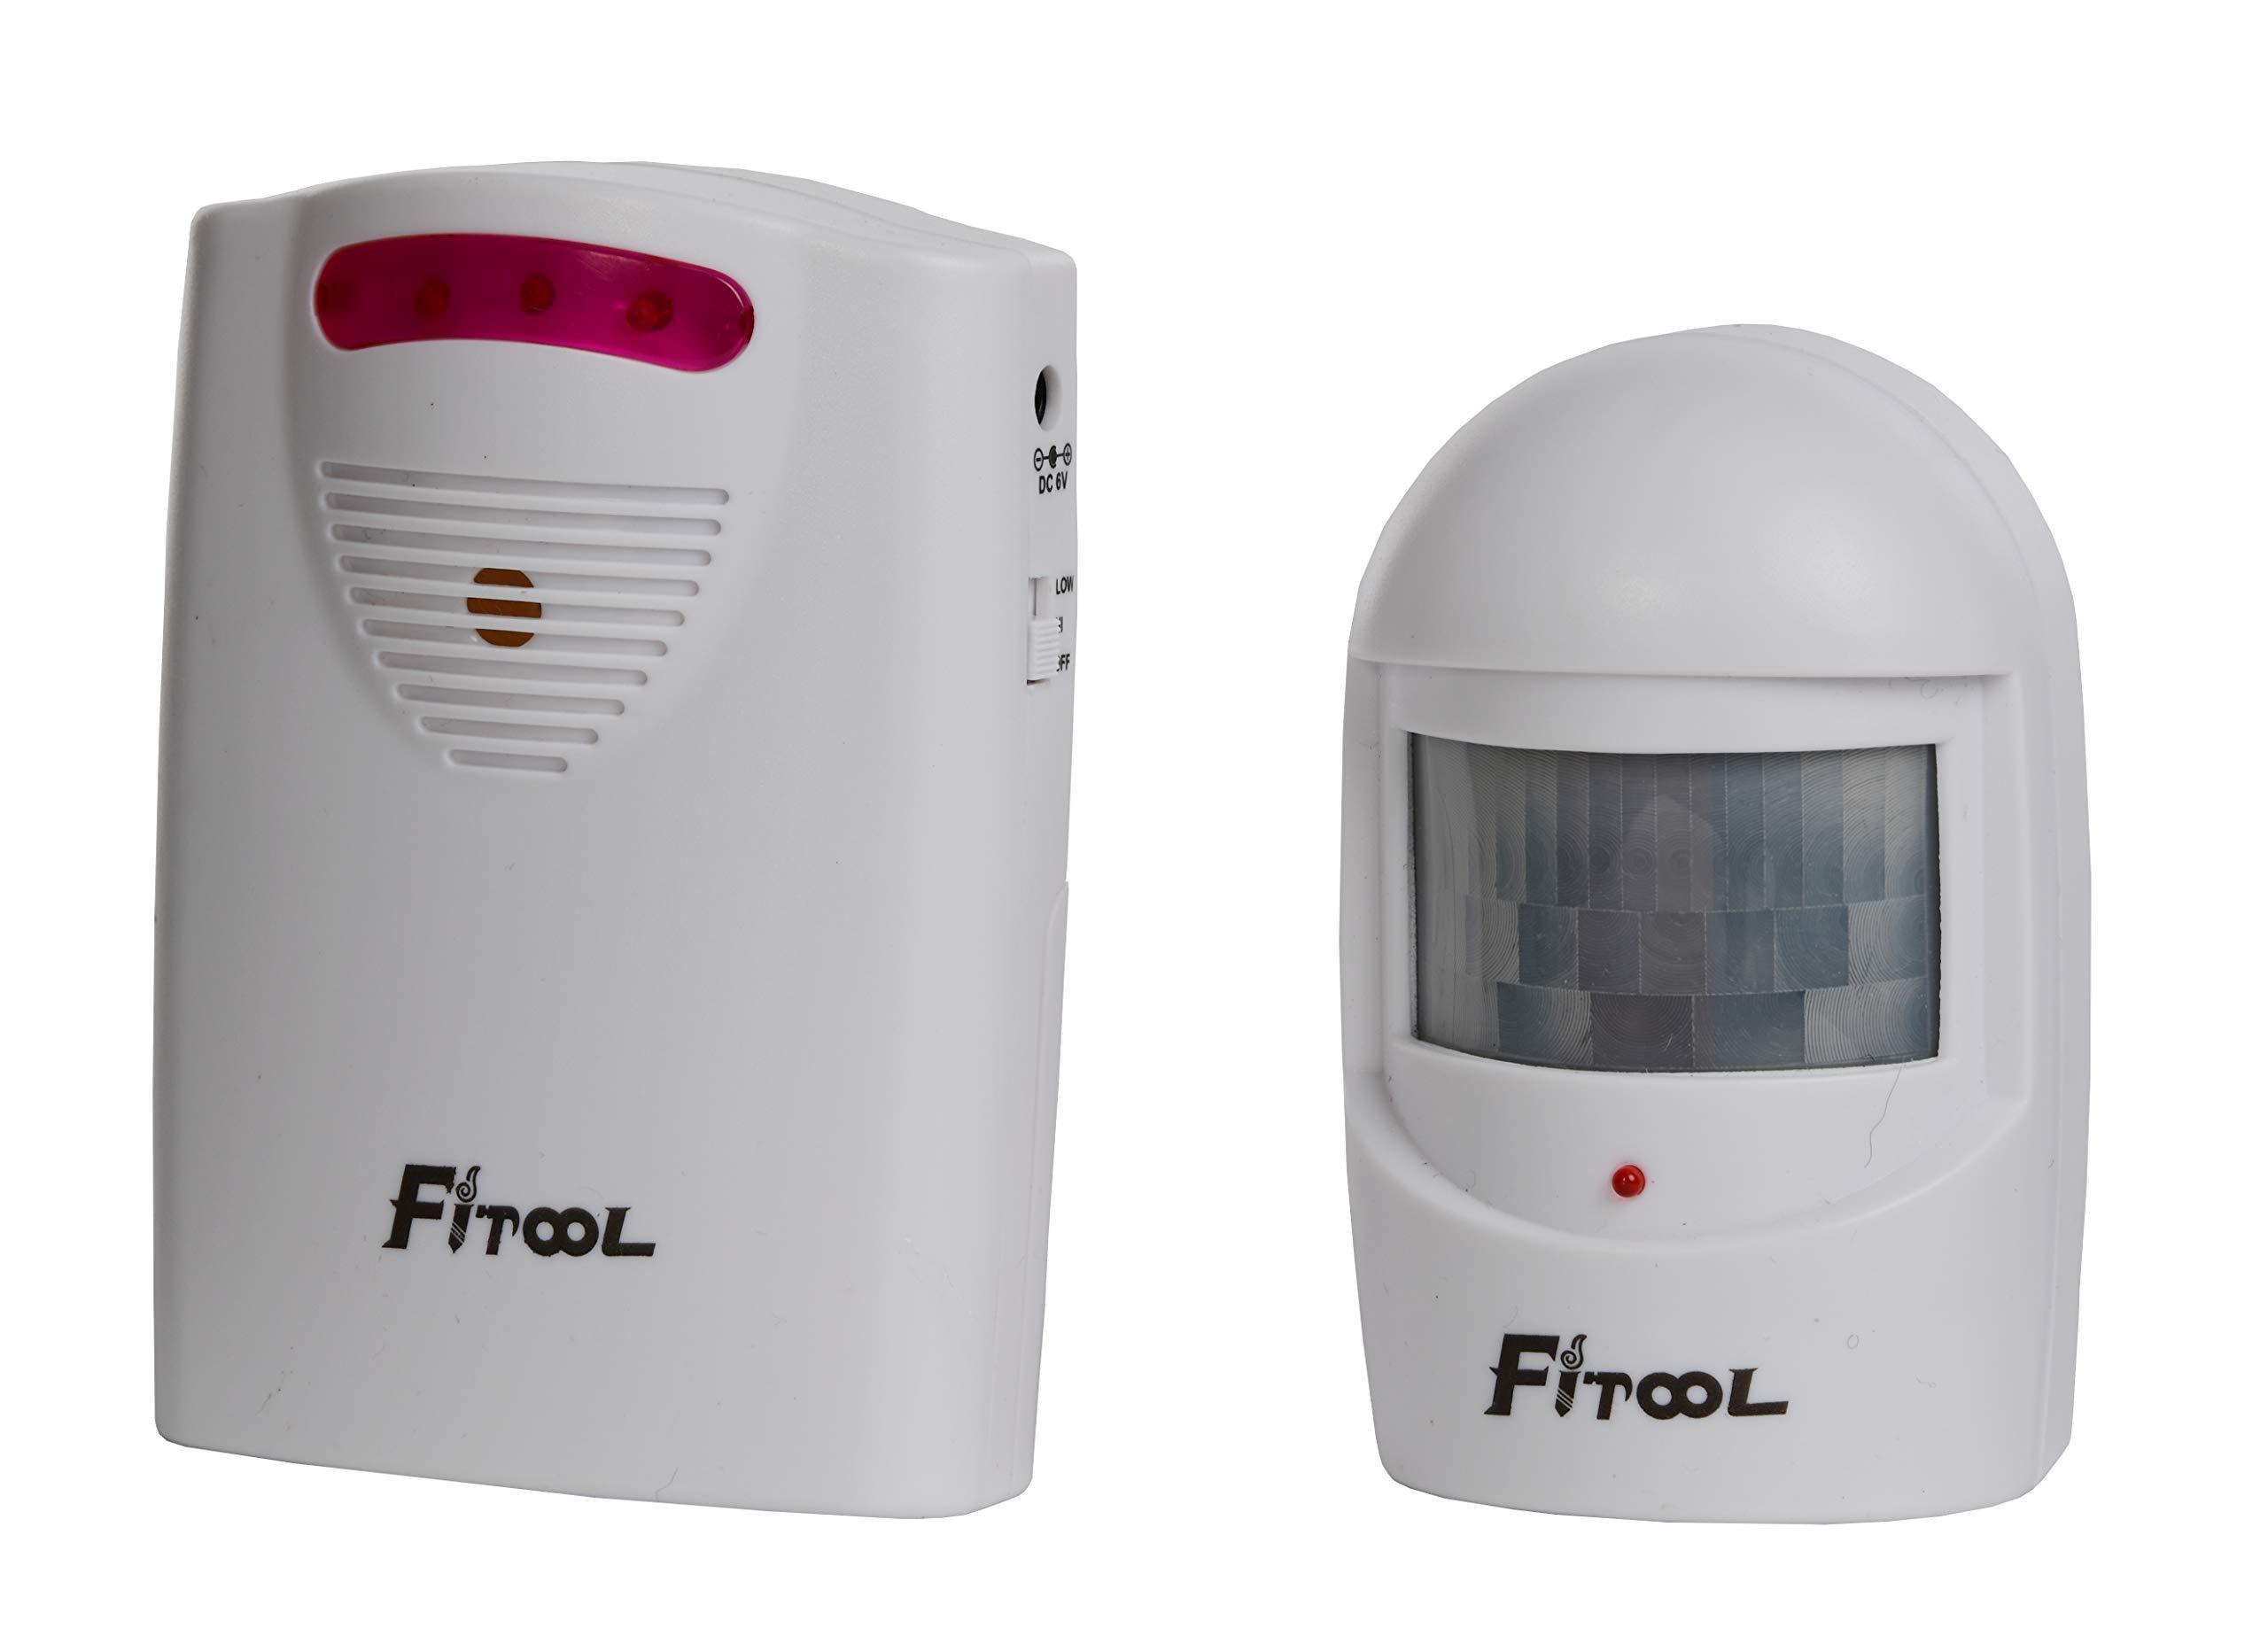 Wireless Driveway Alarm,Home Security Alarm,PIR Motion Sensor Alert System by FITOOL